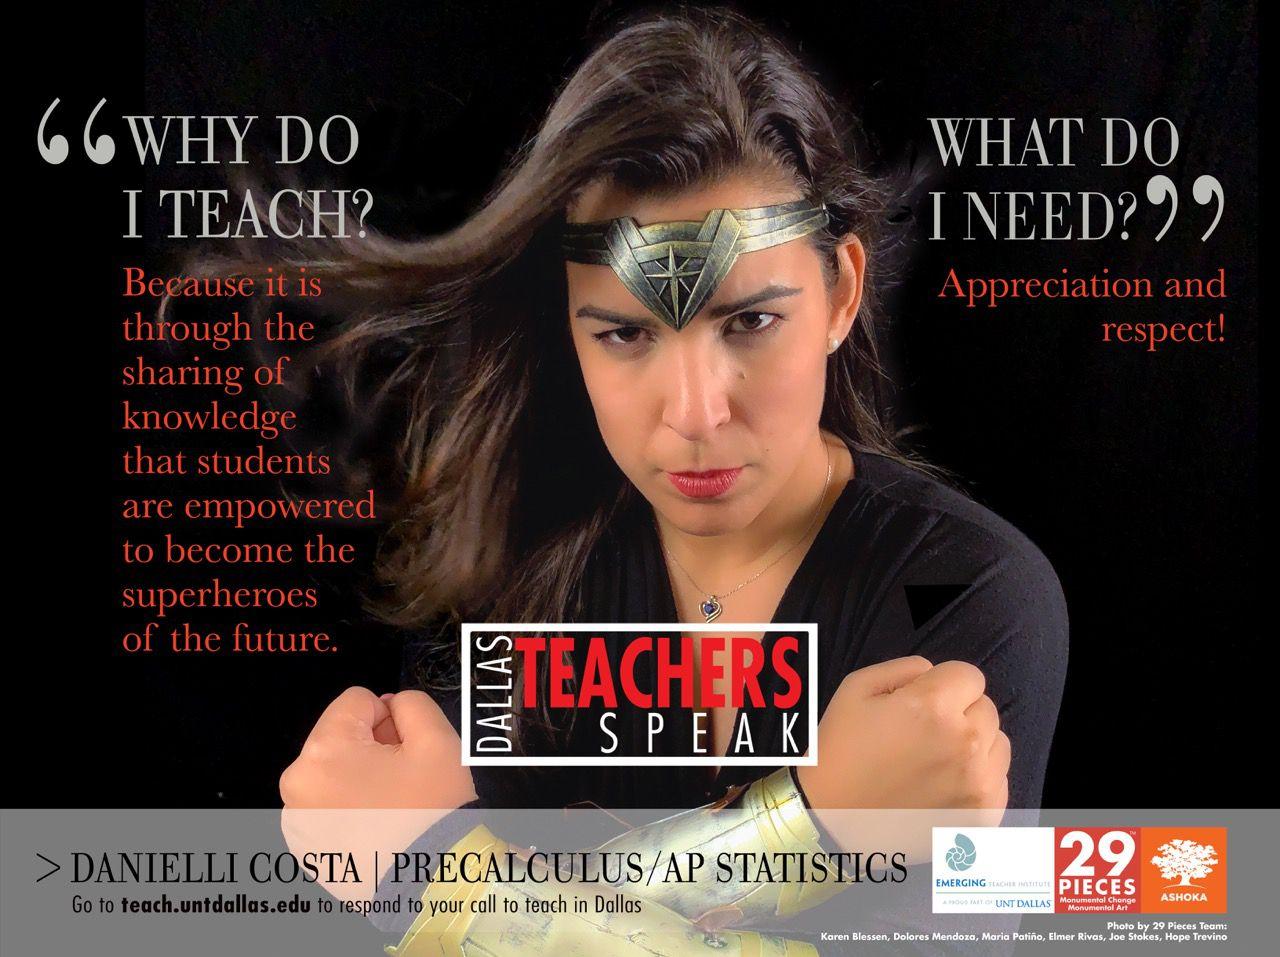 One of the posters shows Dallas ISD teacher Danielli Costa in Wonder Woman accessories.